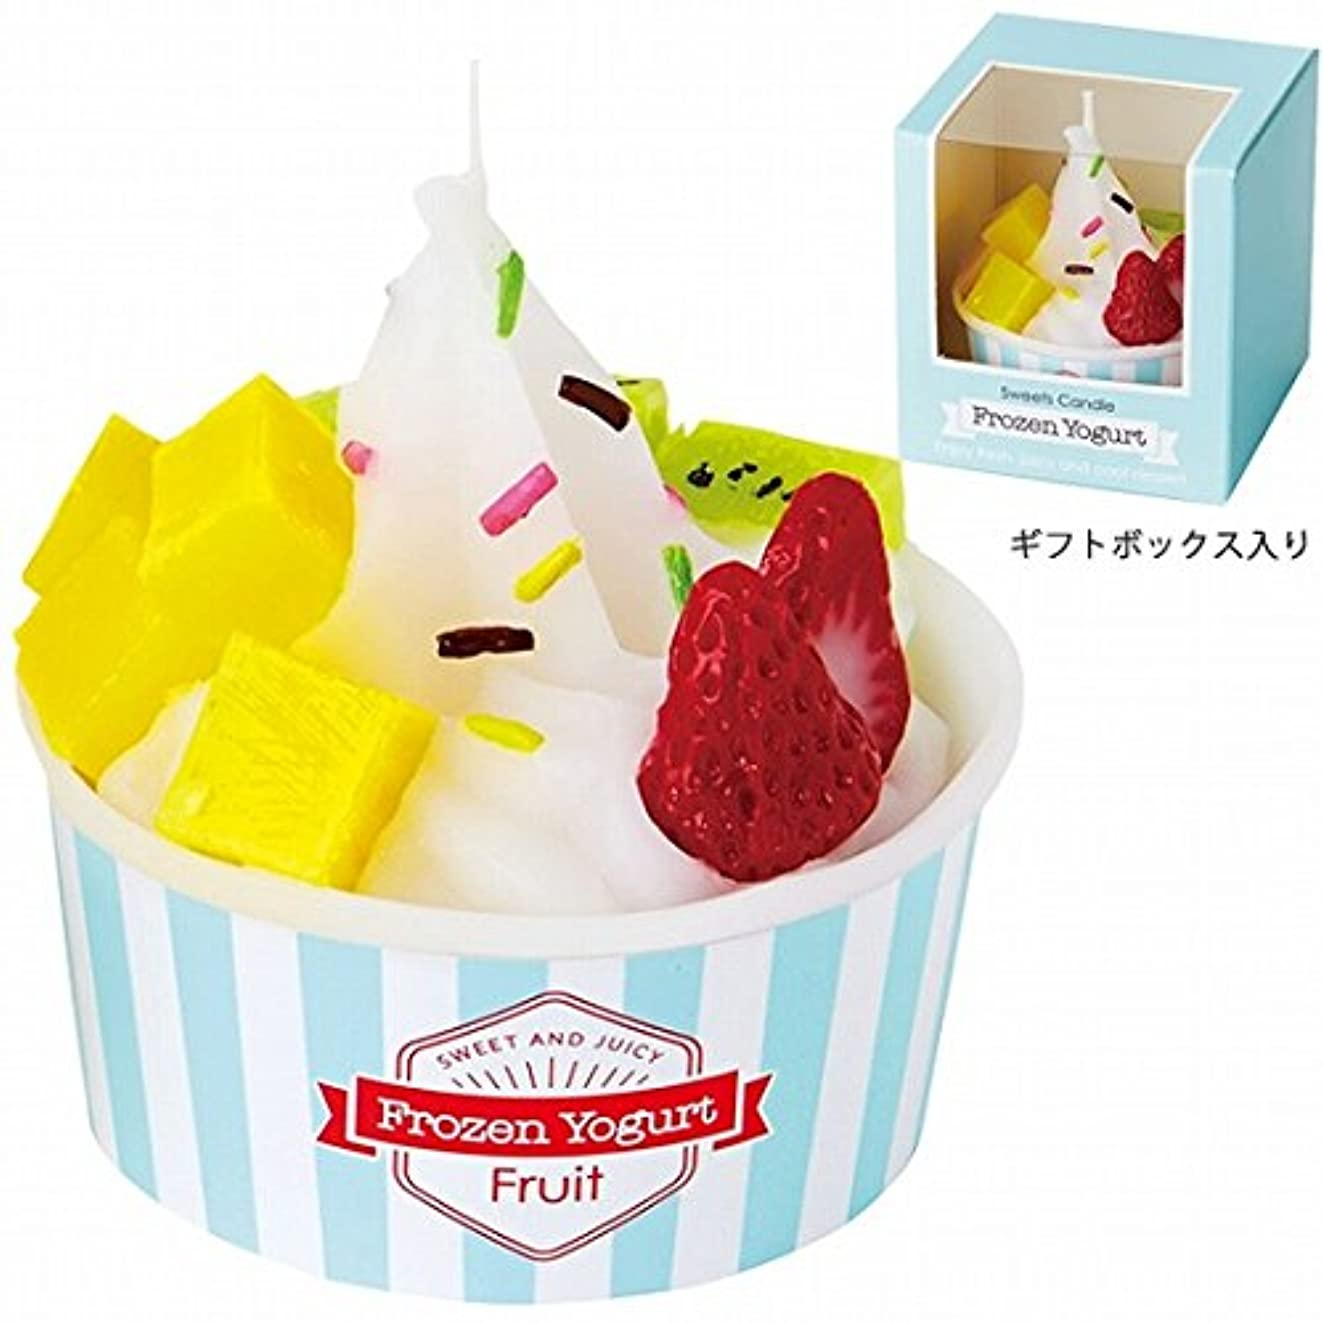 kameyama candle(カメヤマキャンドル) フローズンヨーグルトキャンドル 「フルーツ」 4個セット(A4670520)